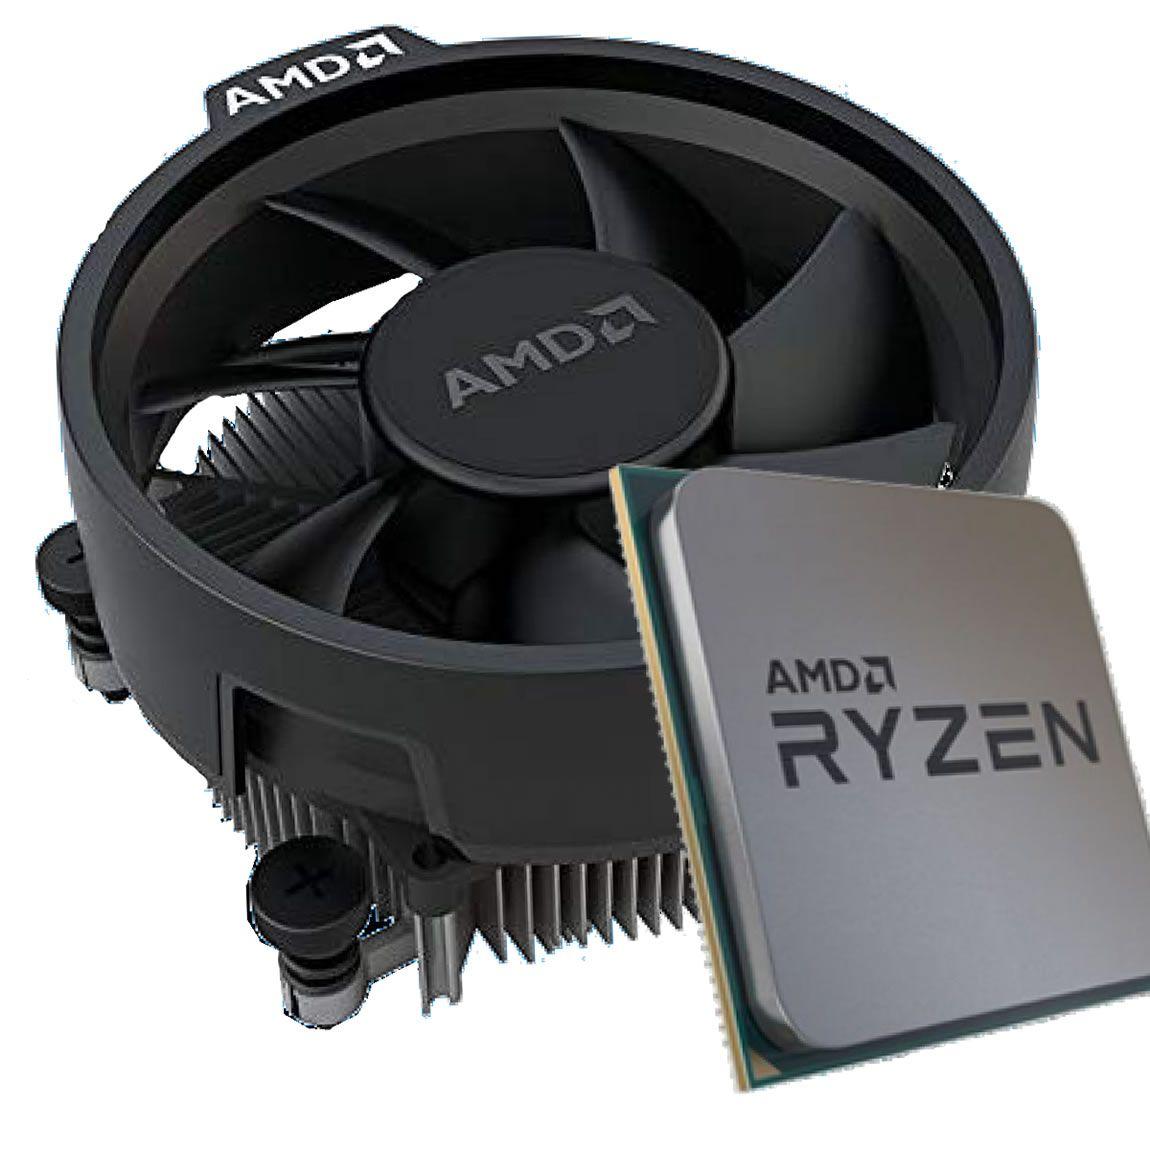 Processador AMD Ryzen 3 3200G Cache 4MB 3.6GHz AM4 Vídeo Vega 8